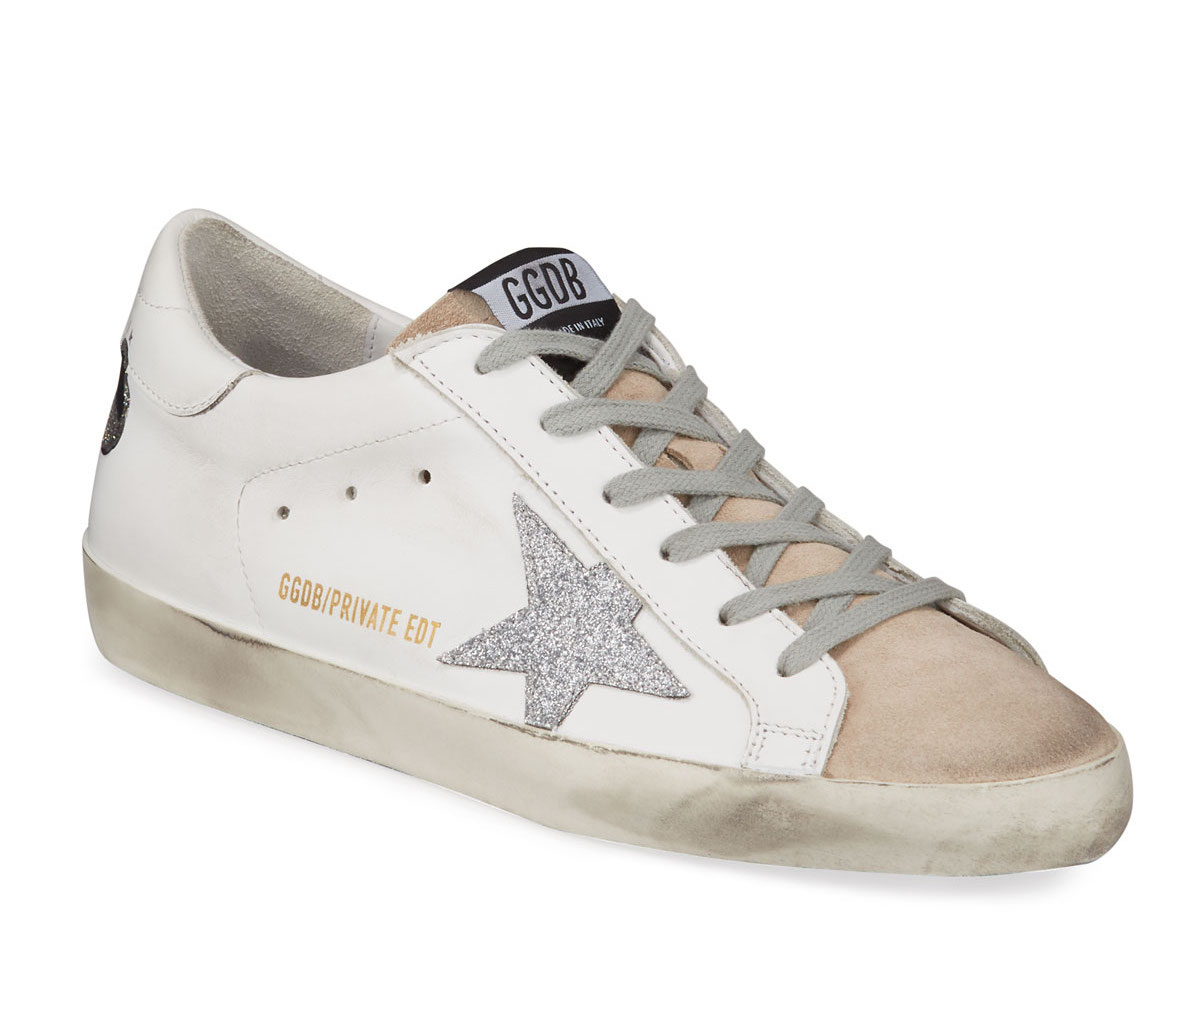 Golden Goose Sneakers On Sale